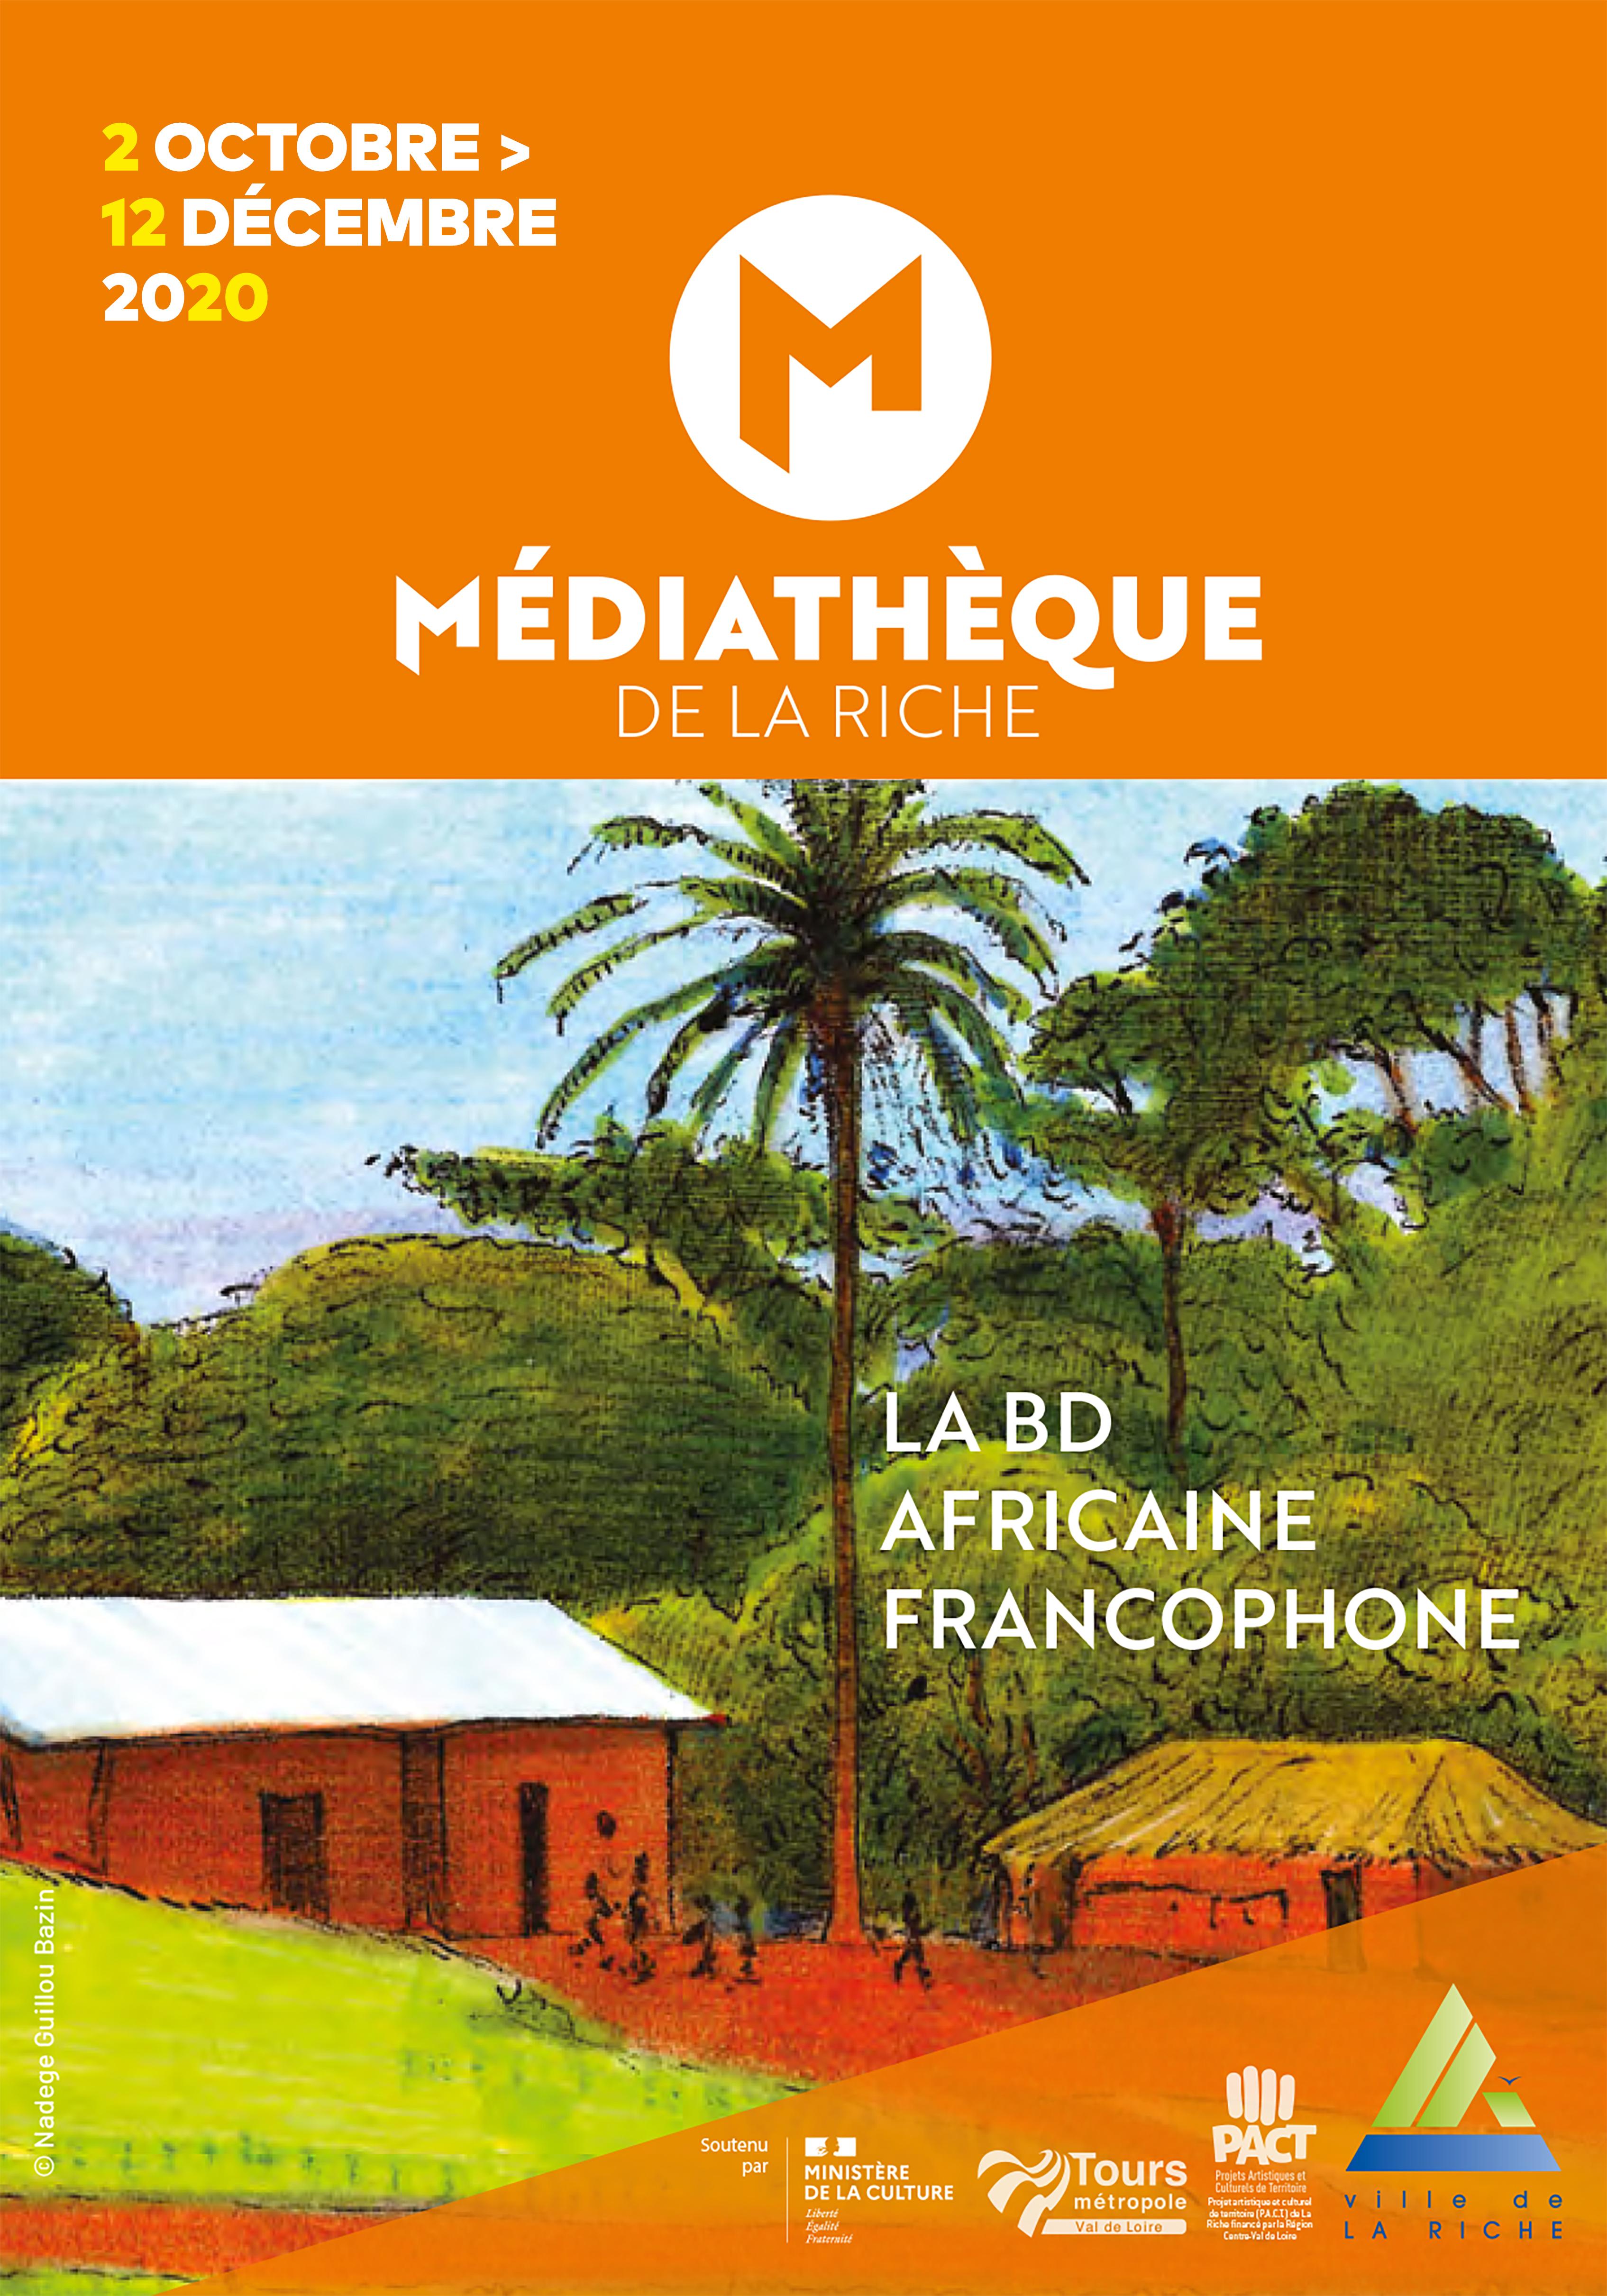 La BD africaine francophone